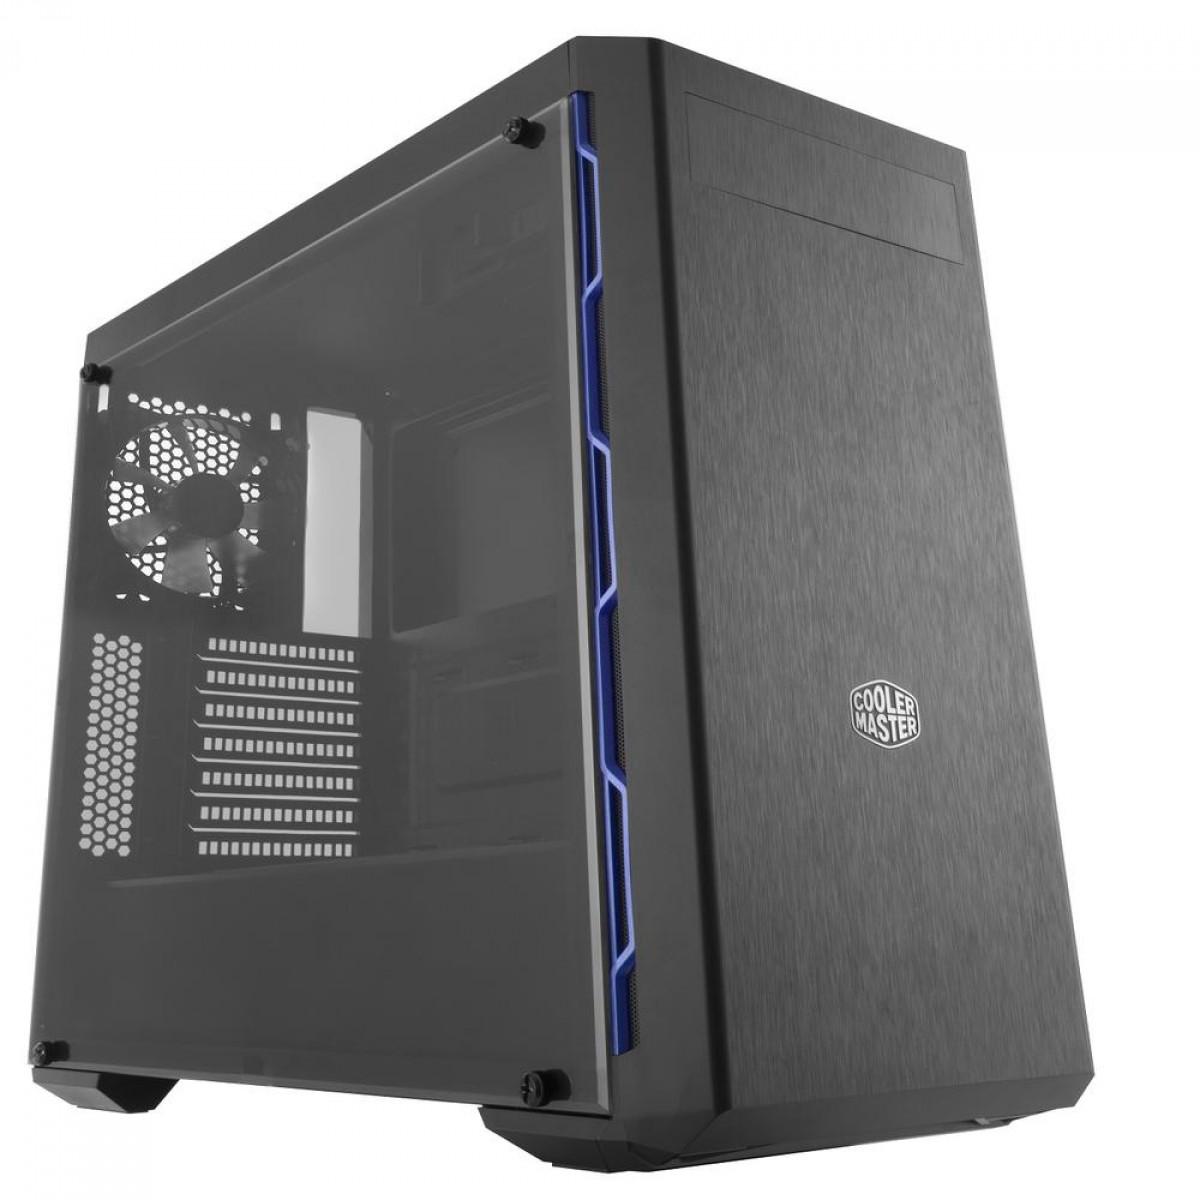 Gabinete Gamer Cooler Master MasterBoc MB600L, Mid Tower, Black/Blue, ATX, Com ODD, Sem Fonte, Com 1 Fan, MCB-B600L-KA5N-S01